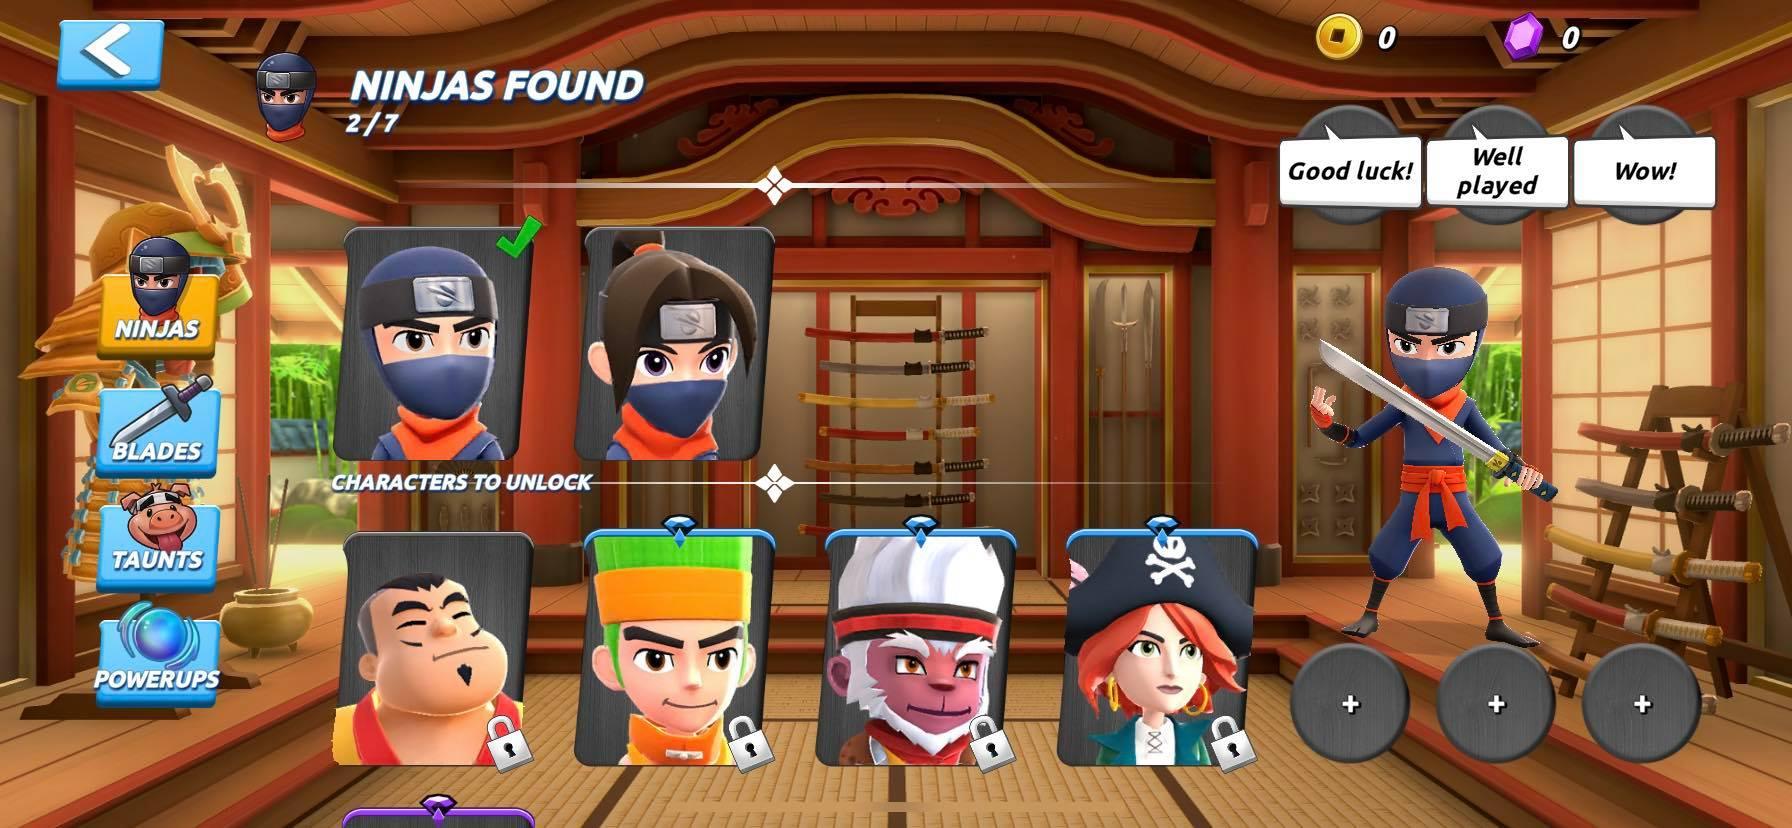 Mua sắm trong Fruit Ninja 2